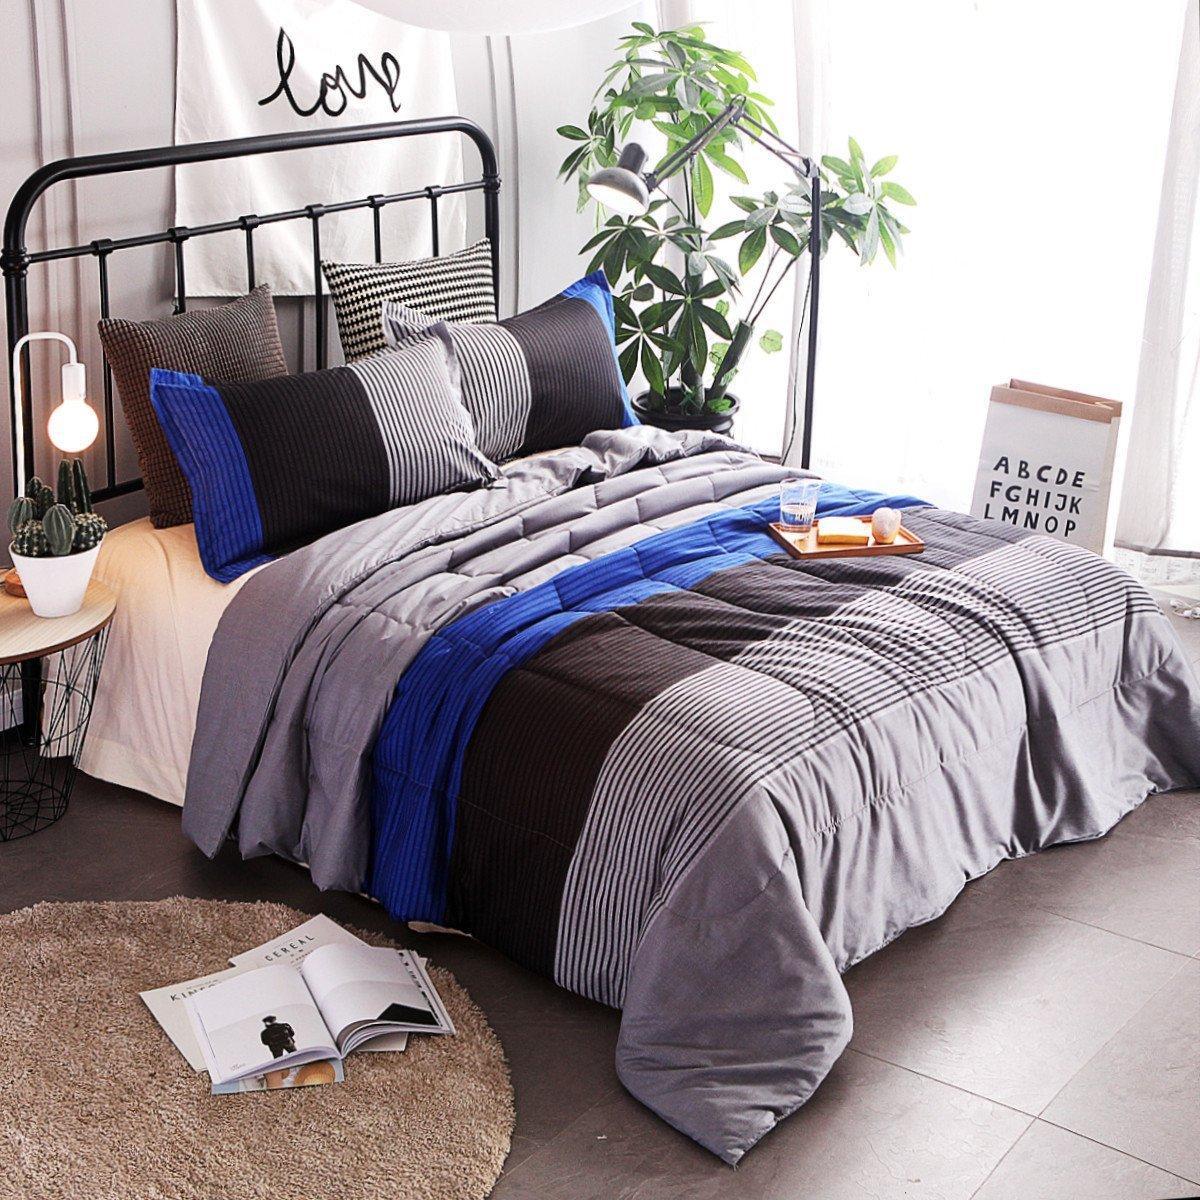 Queen Comforter Sets.Winlife 3 Piece Striped Quilt Set Boys Bedspreads Coverlet Sets Comforter Sets Queen